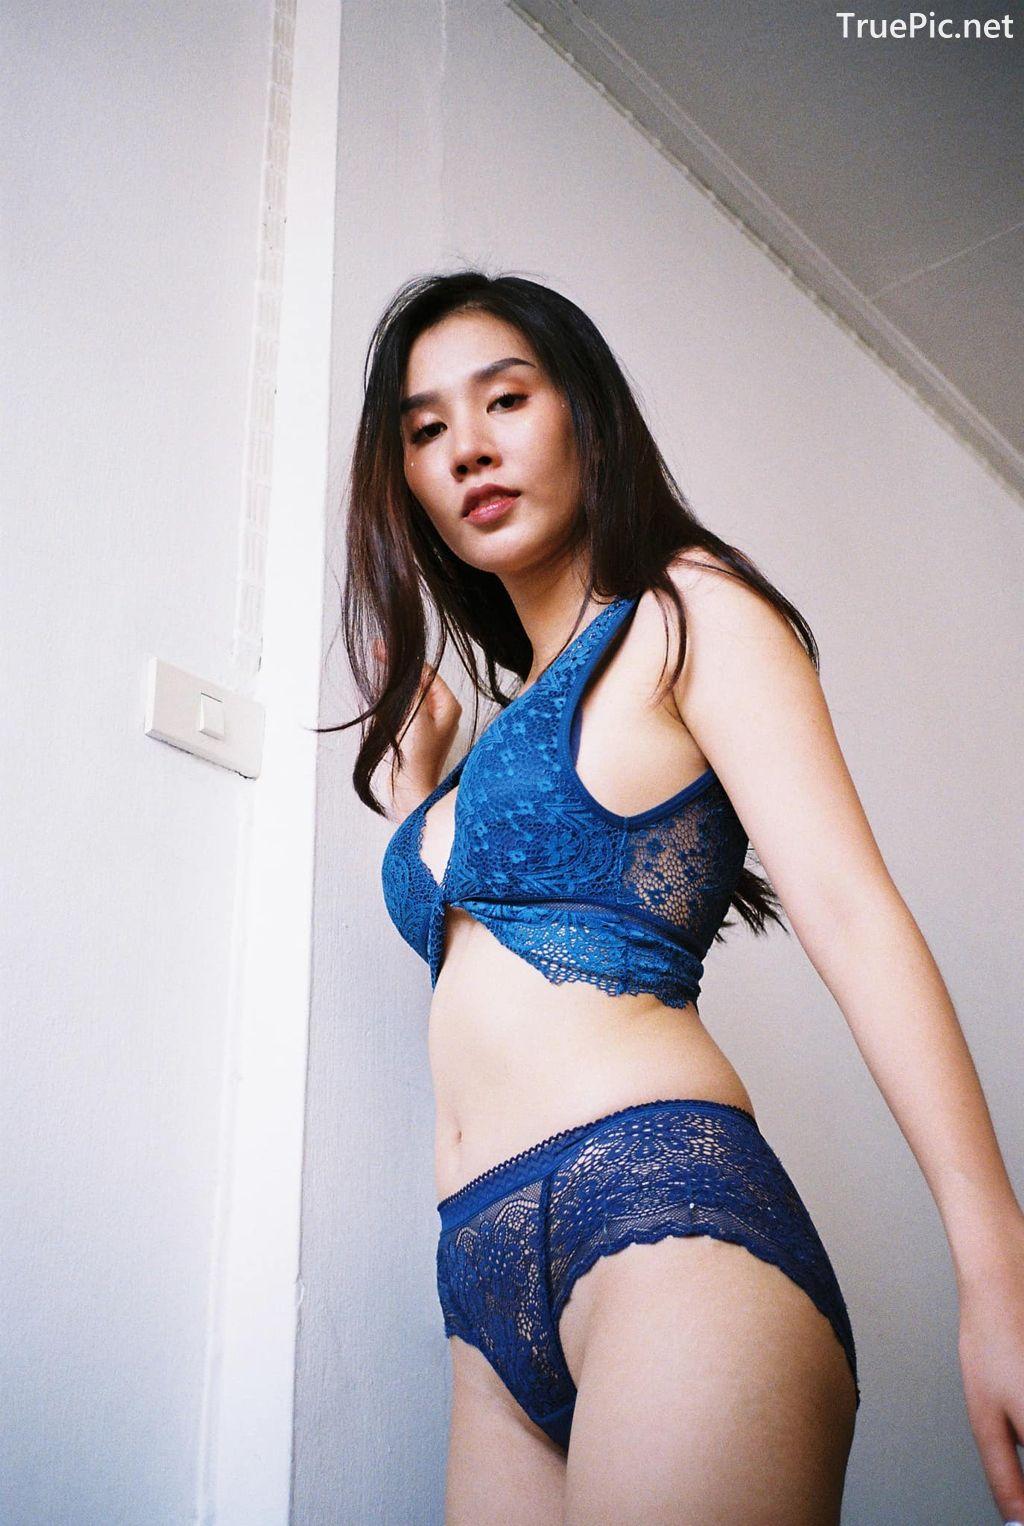 Image-Thailand-Model-Ssomch-Tanass-Blue-Lingerie-TruePic.net-TruePic.net- Picture-6